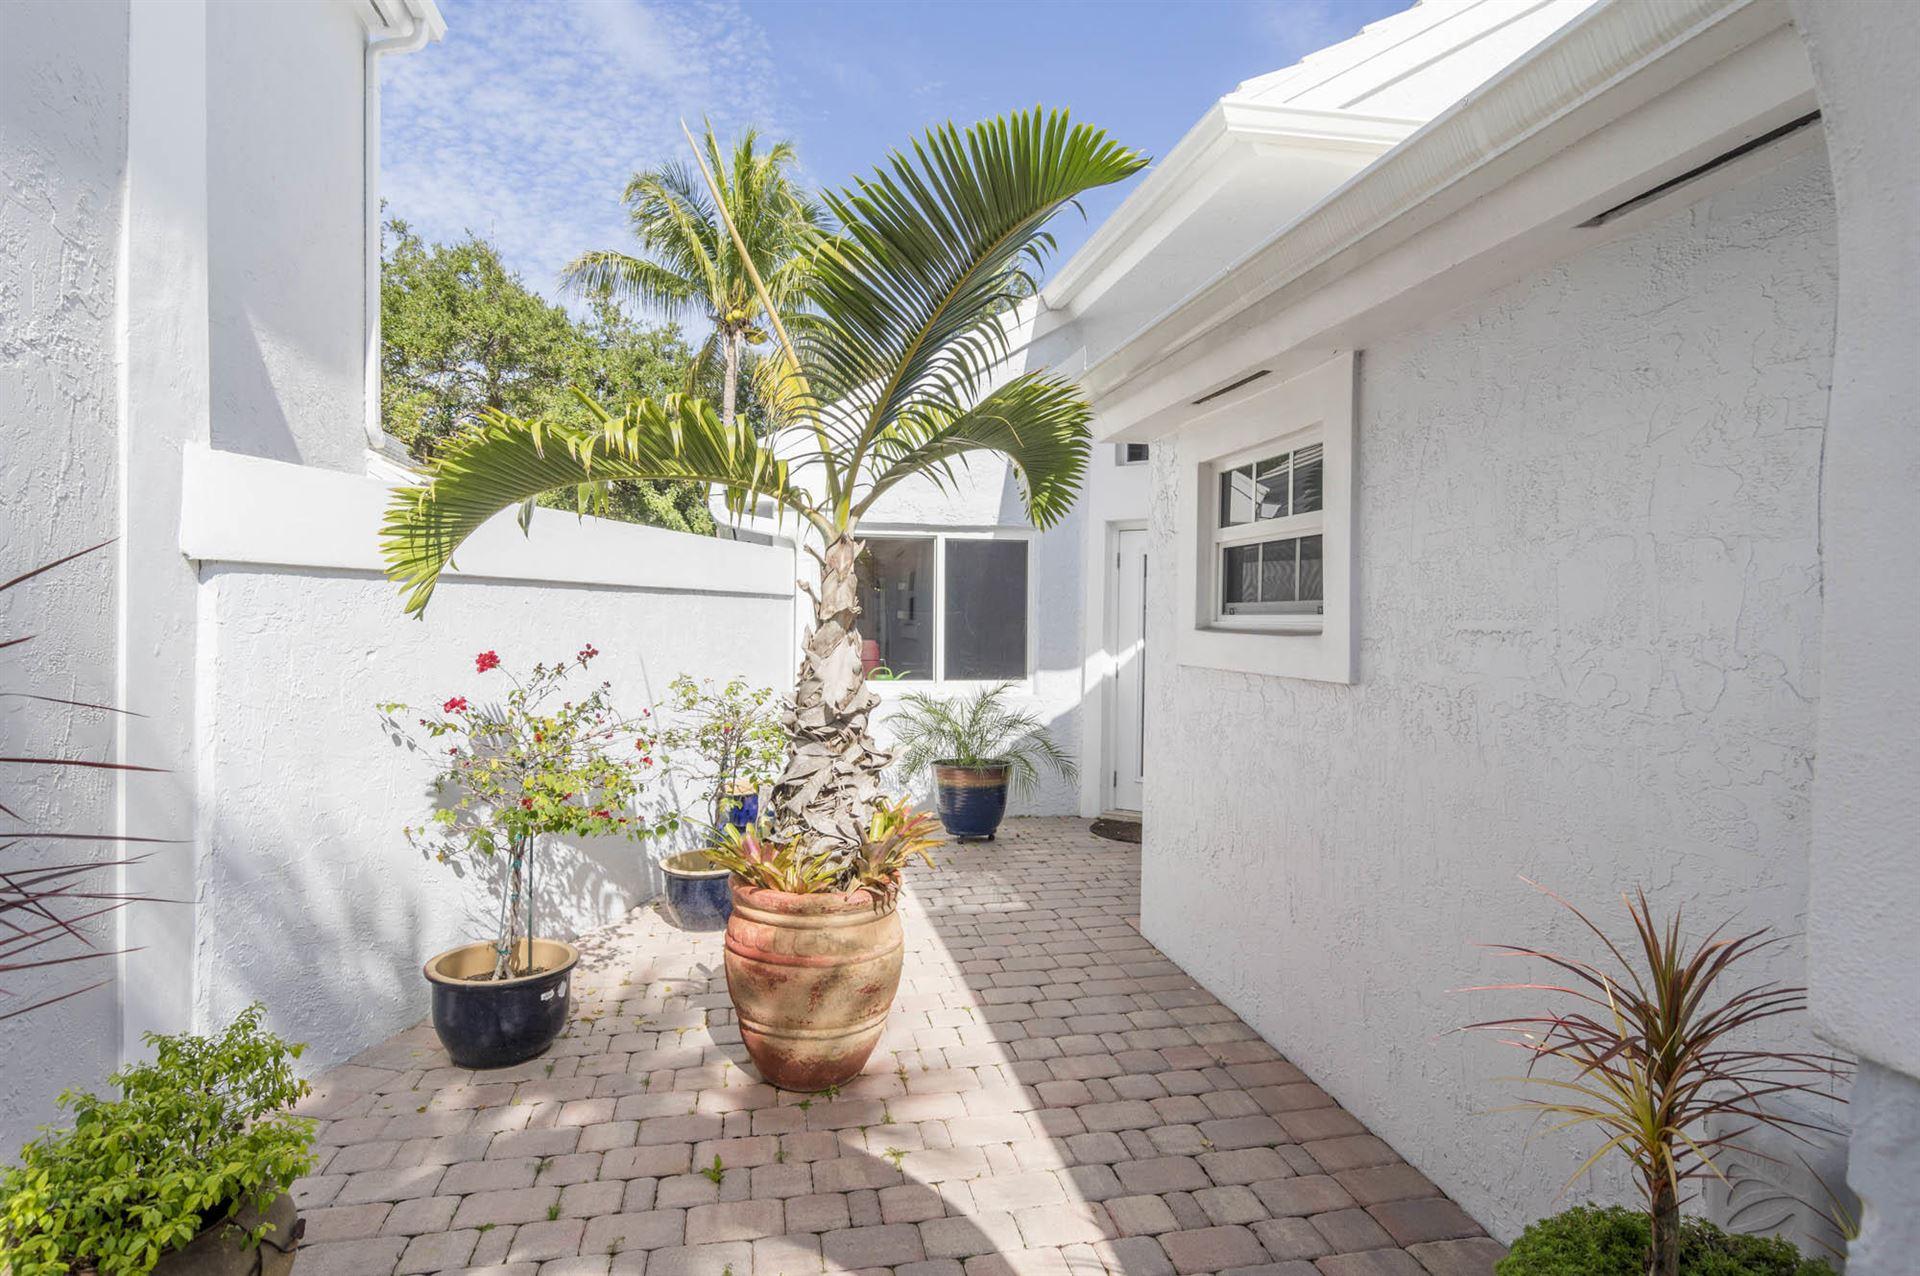 Photo of 2 Hampton Court, Palm Beach Gardens, FL 33418 (MLS # RX-10686504)